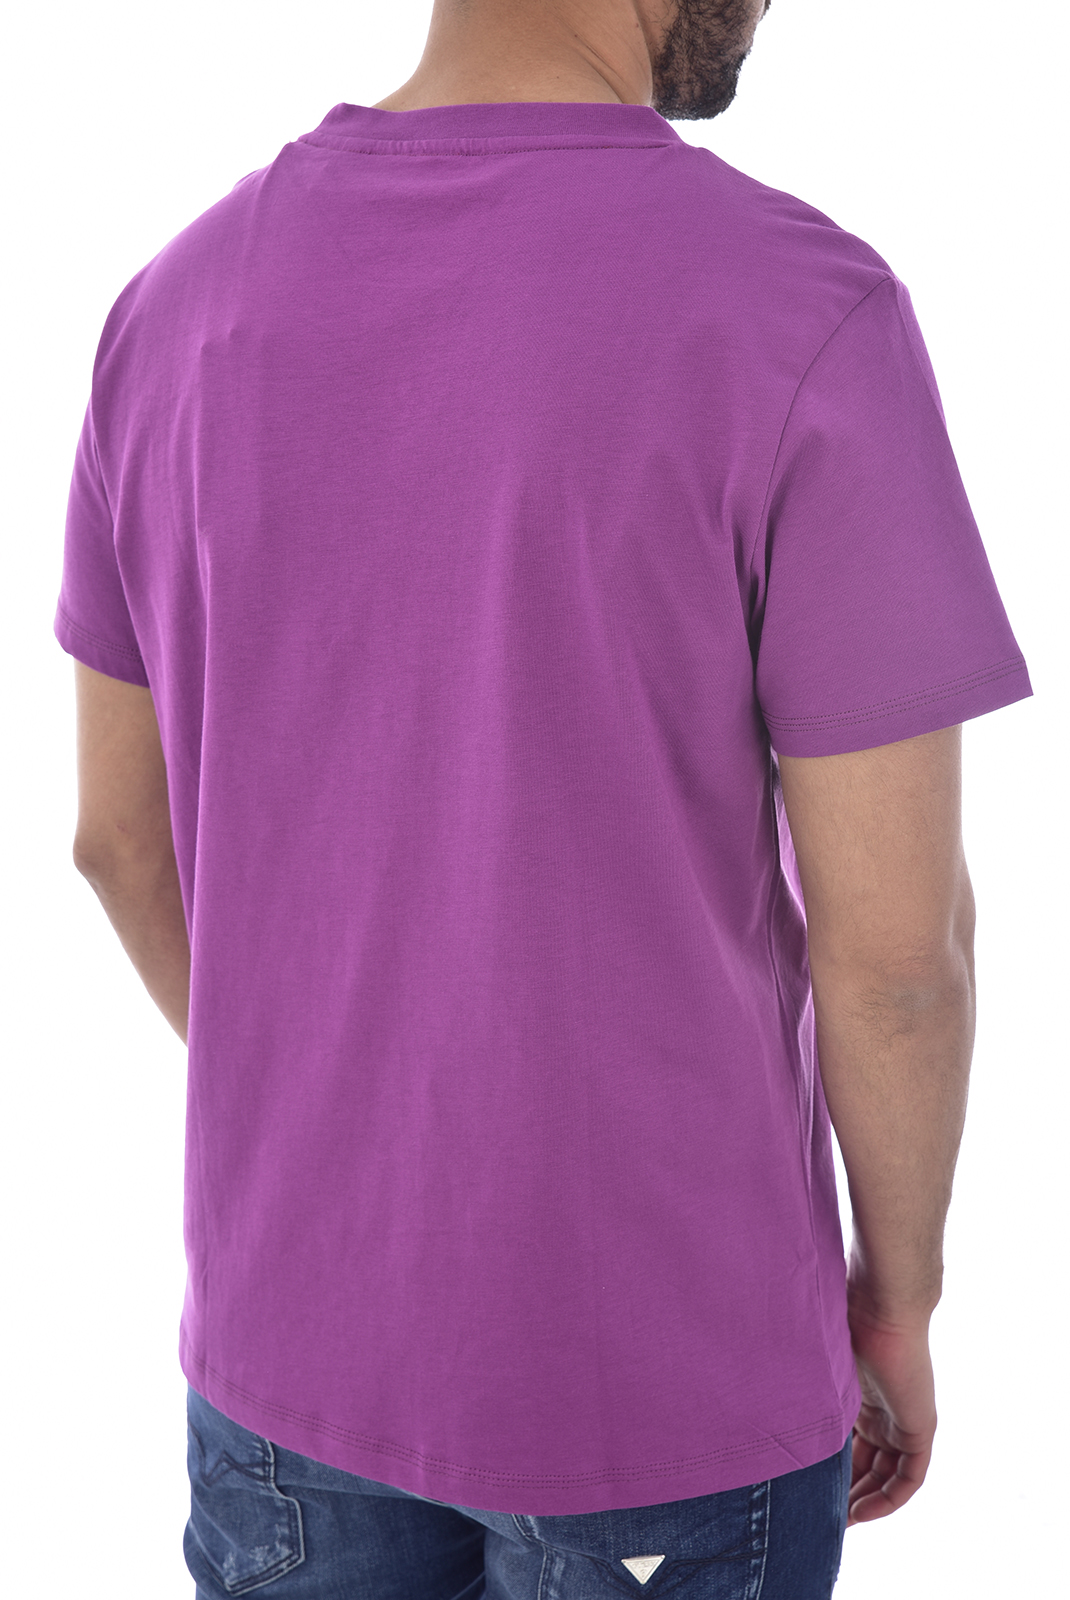 Tee-shirts  Guess jeans F92I00 JR03D G4B4 PRIMROSE VIOLET